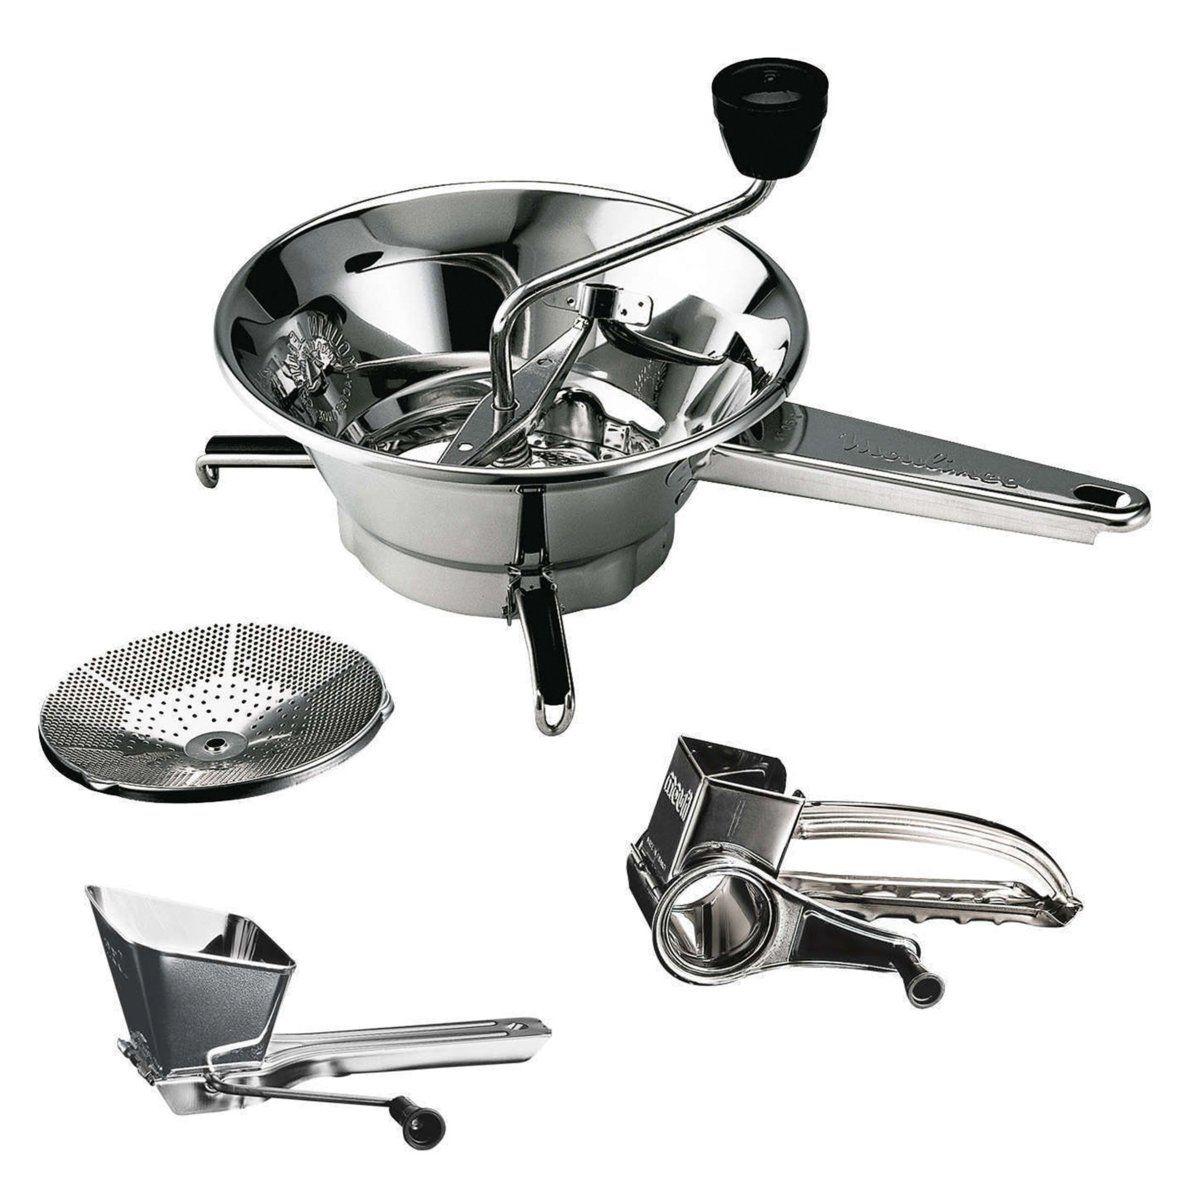 Ustensiles de cuisine inox a45606 a45506 a45306 moulinex for Ustensile de cuisine inox